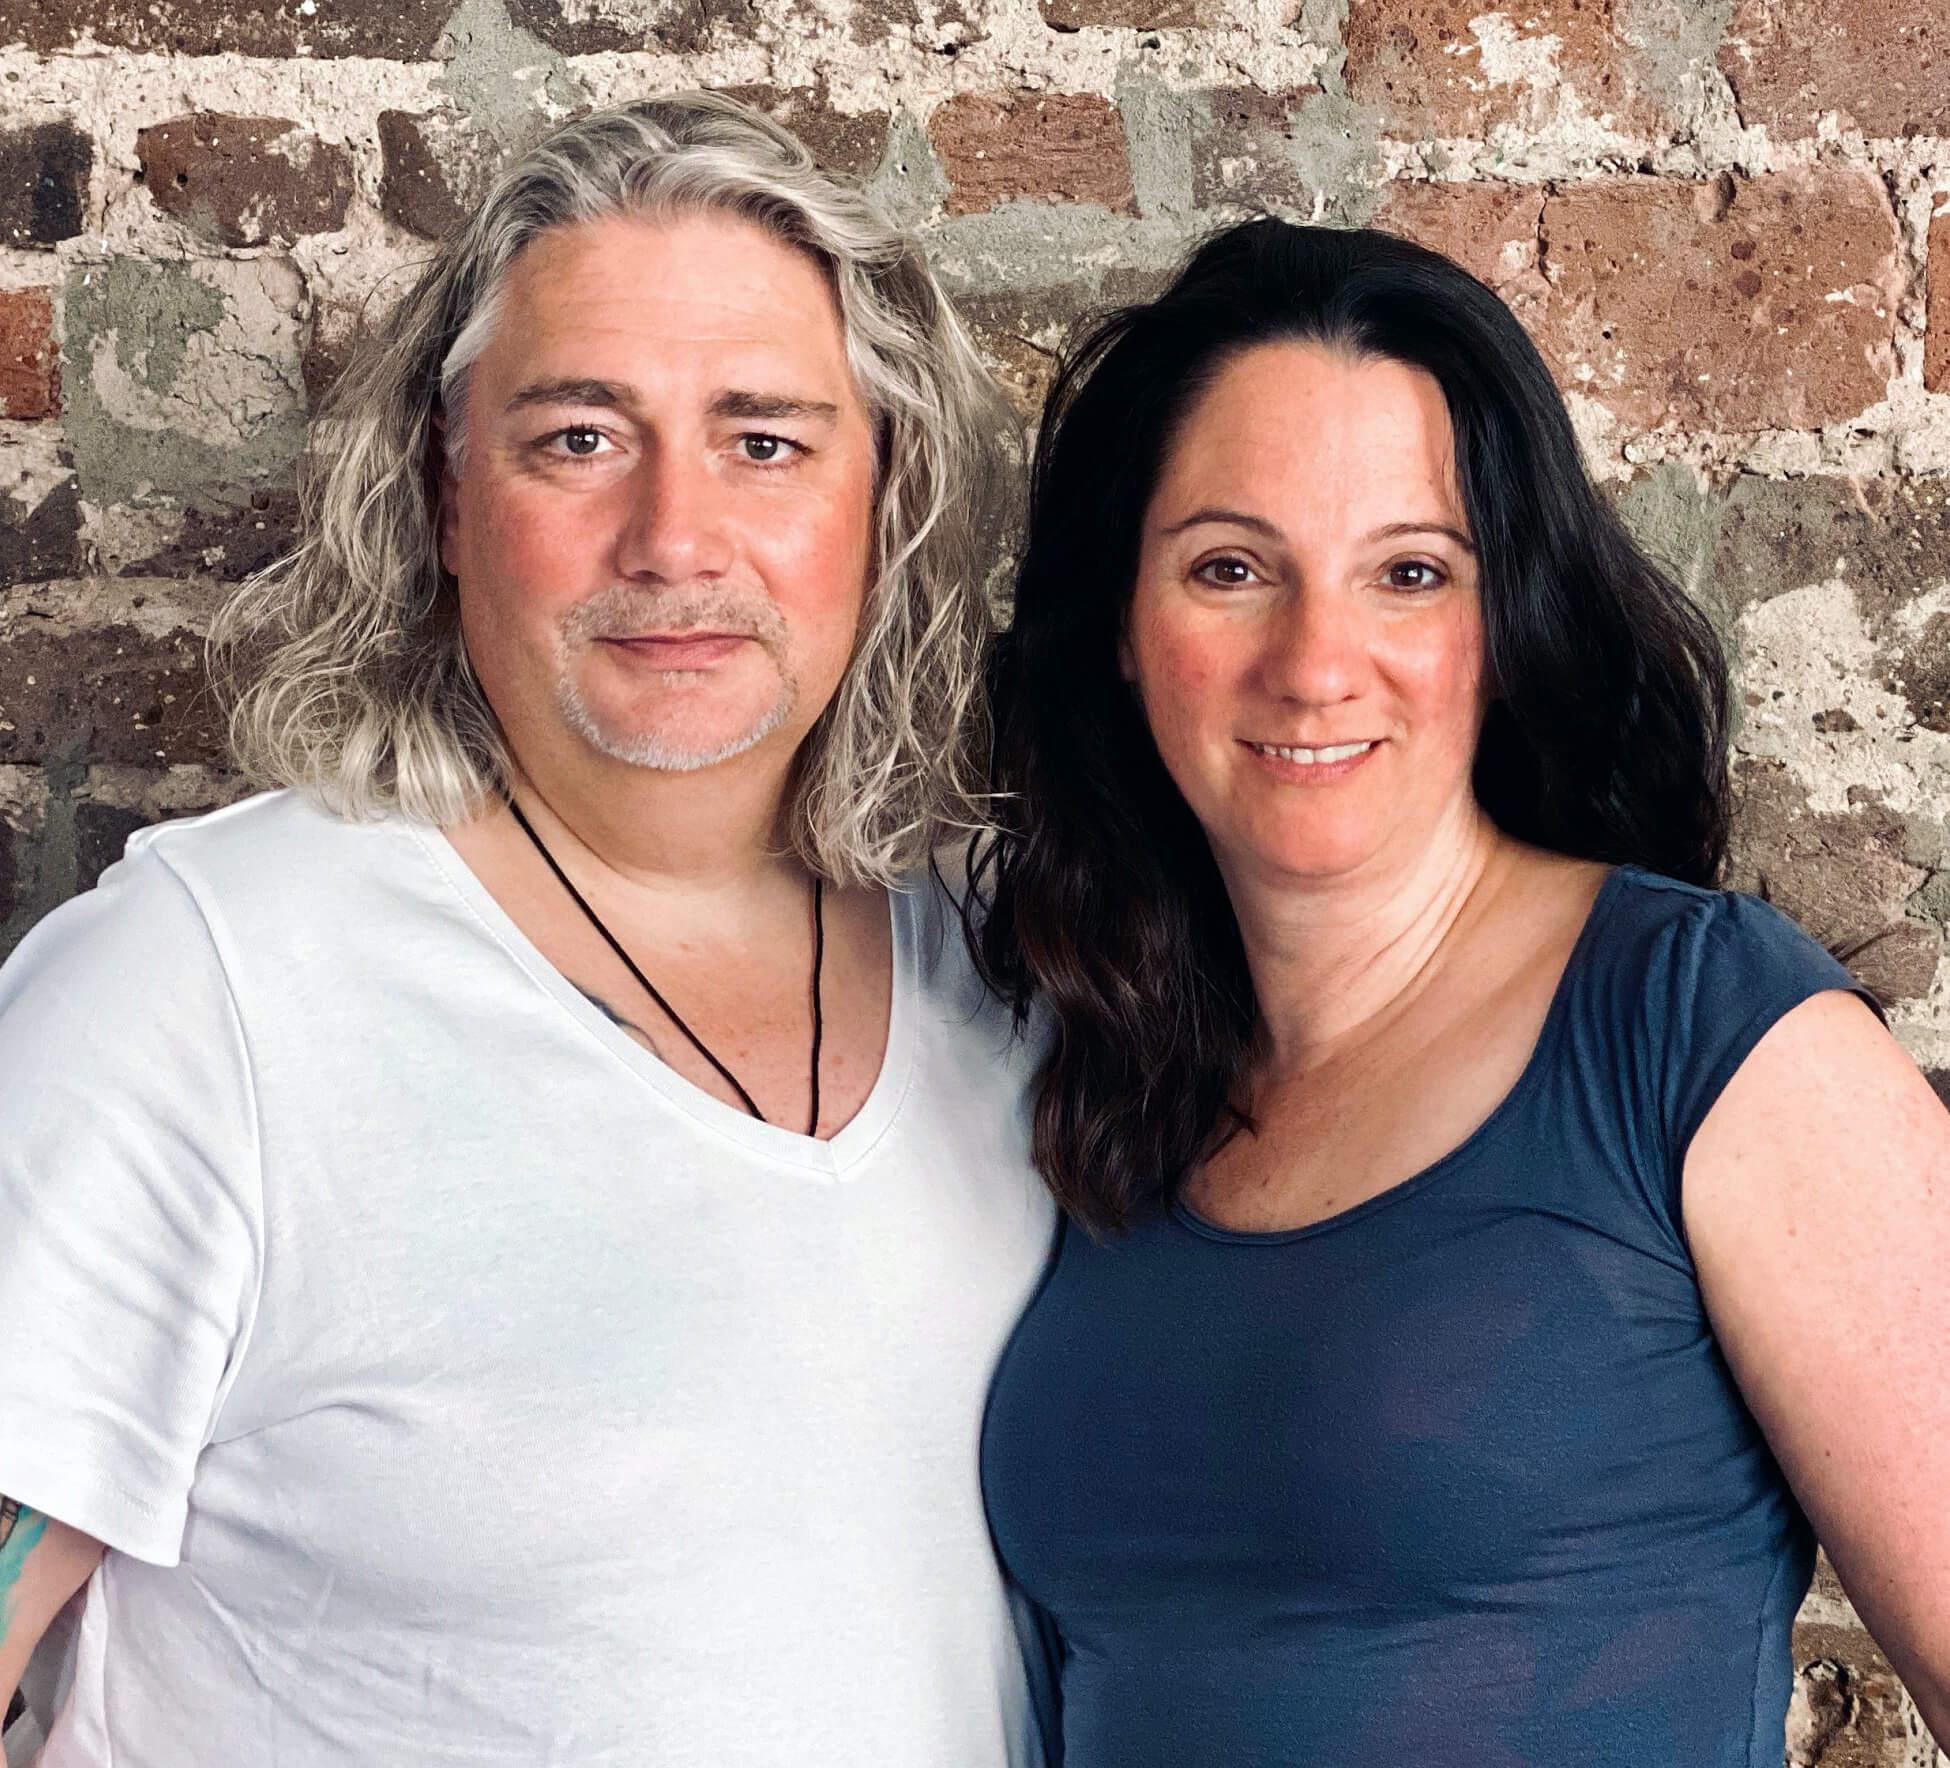 Harald Berenfänger und Julia Kamenik von www.liebeszukunft.com – Paarcoaching, Paartherapie, Paarberatung